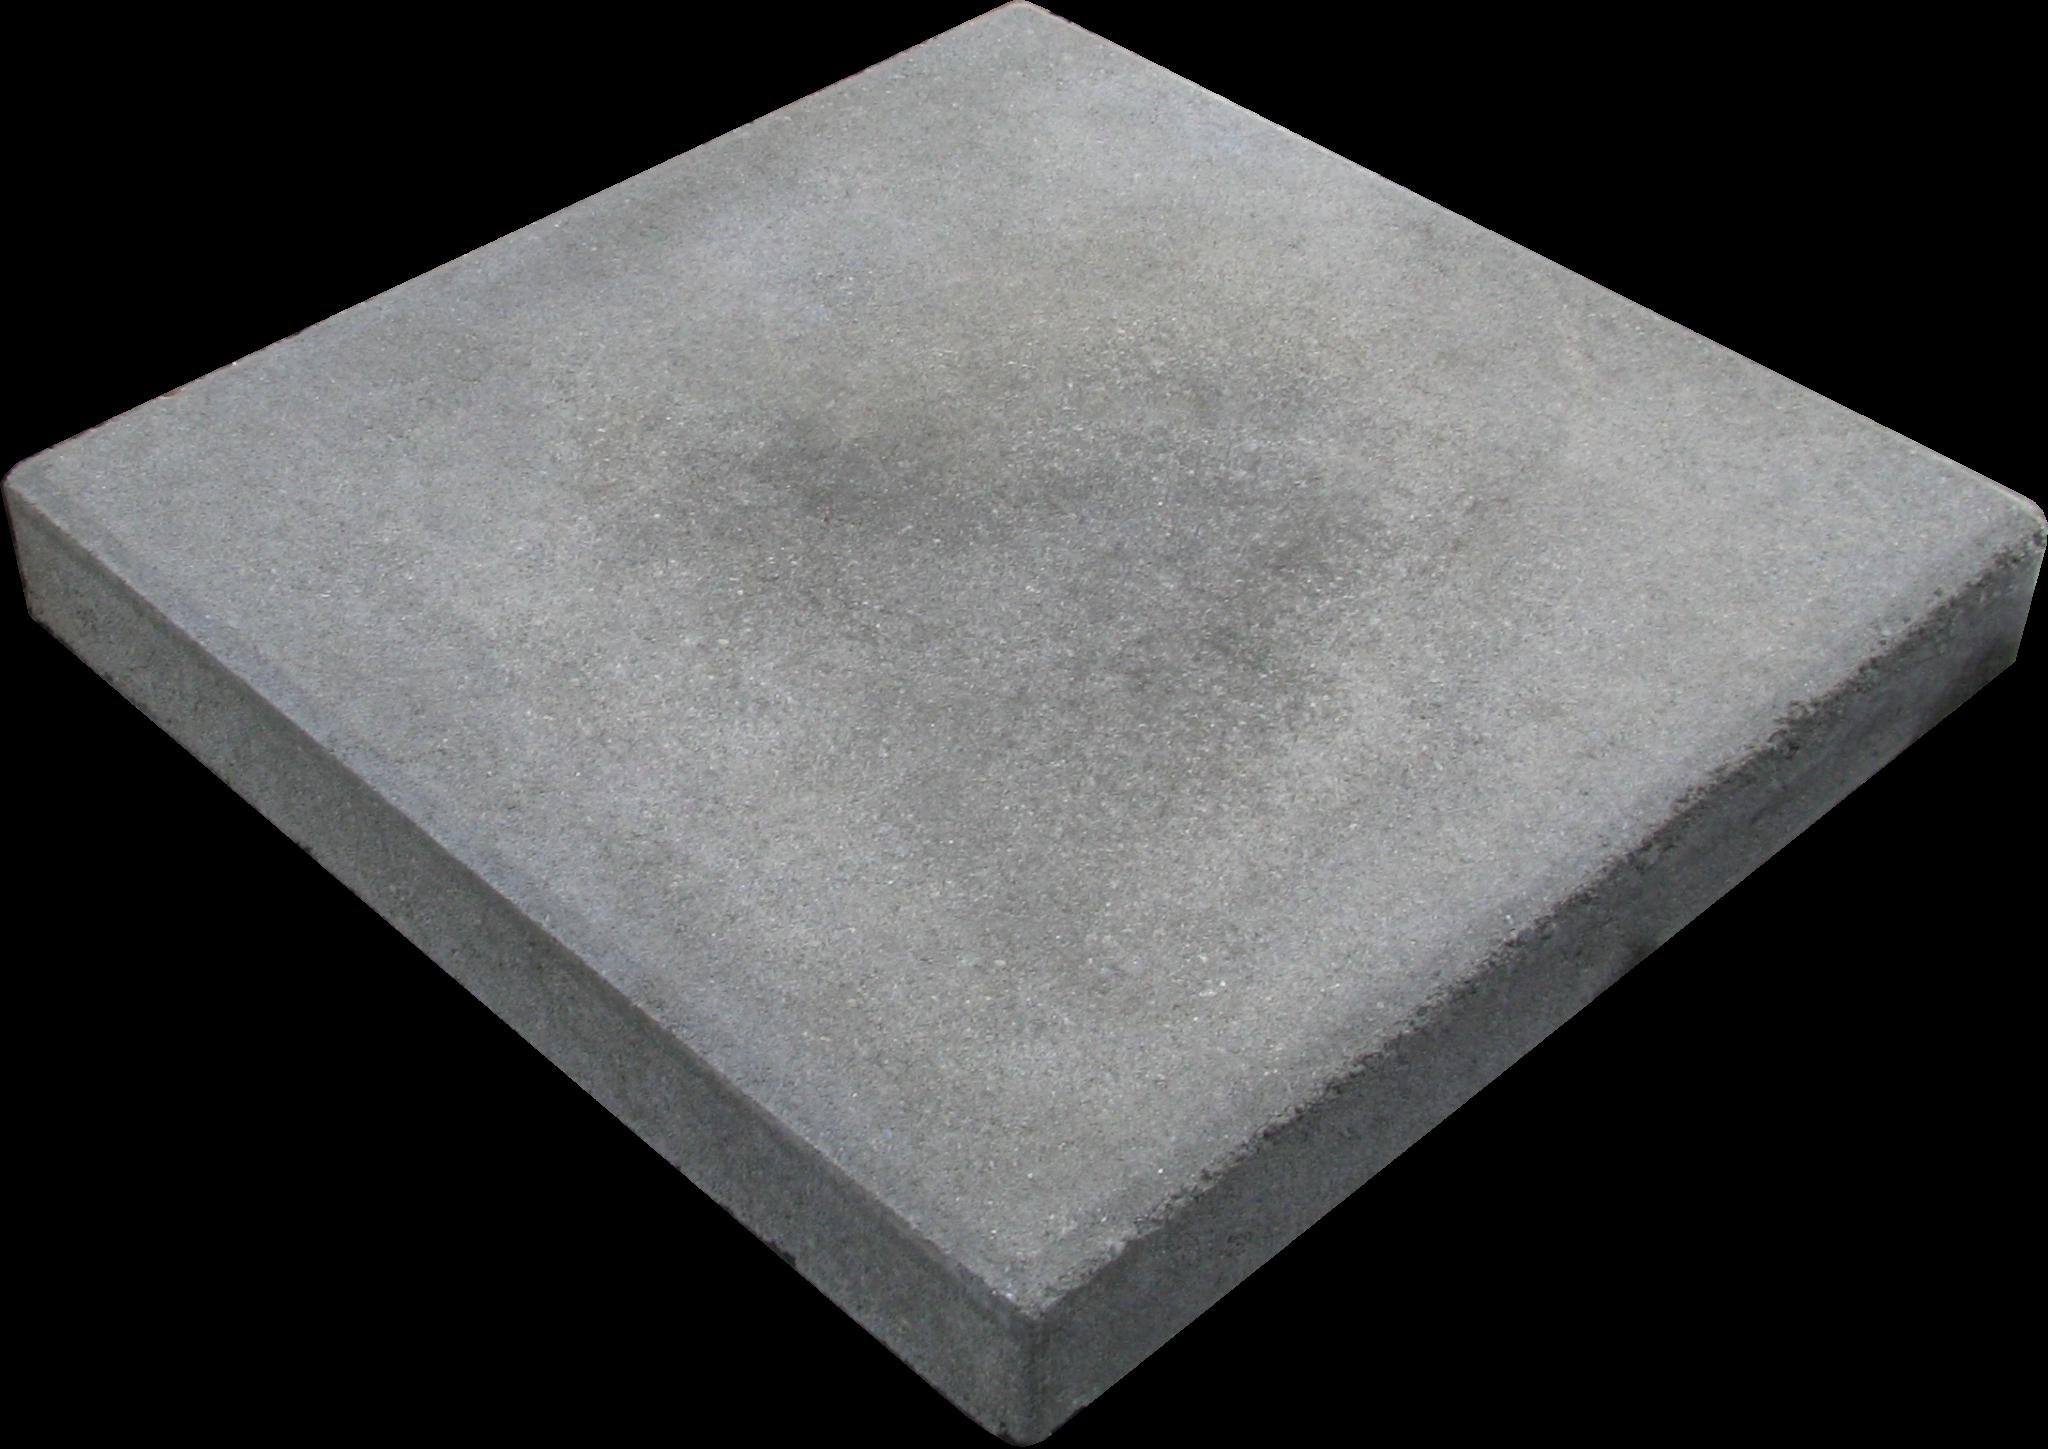 dale beton 40x40 cm scolaro promo srl scolaro promo srl. Black Bedroom Furniture Sets. Home Design Ideas